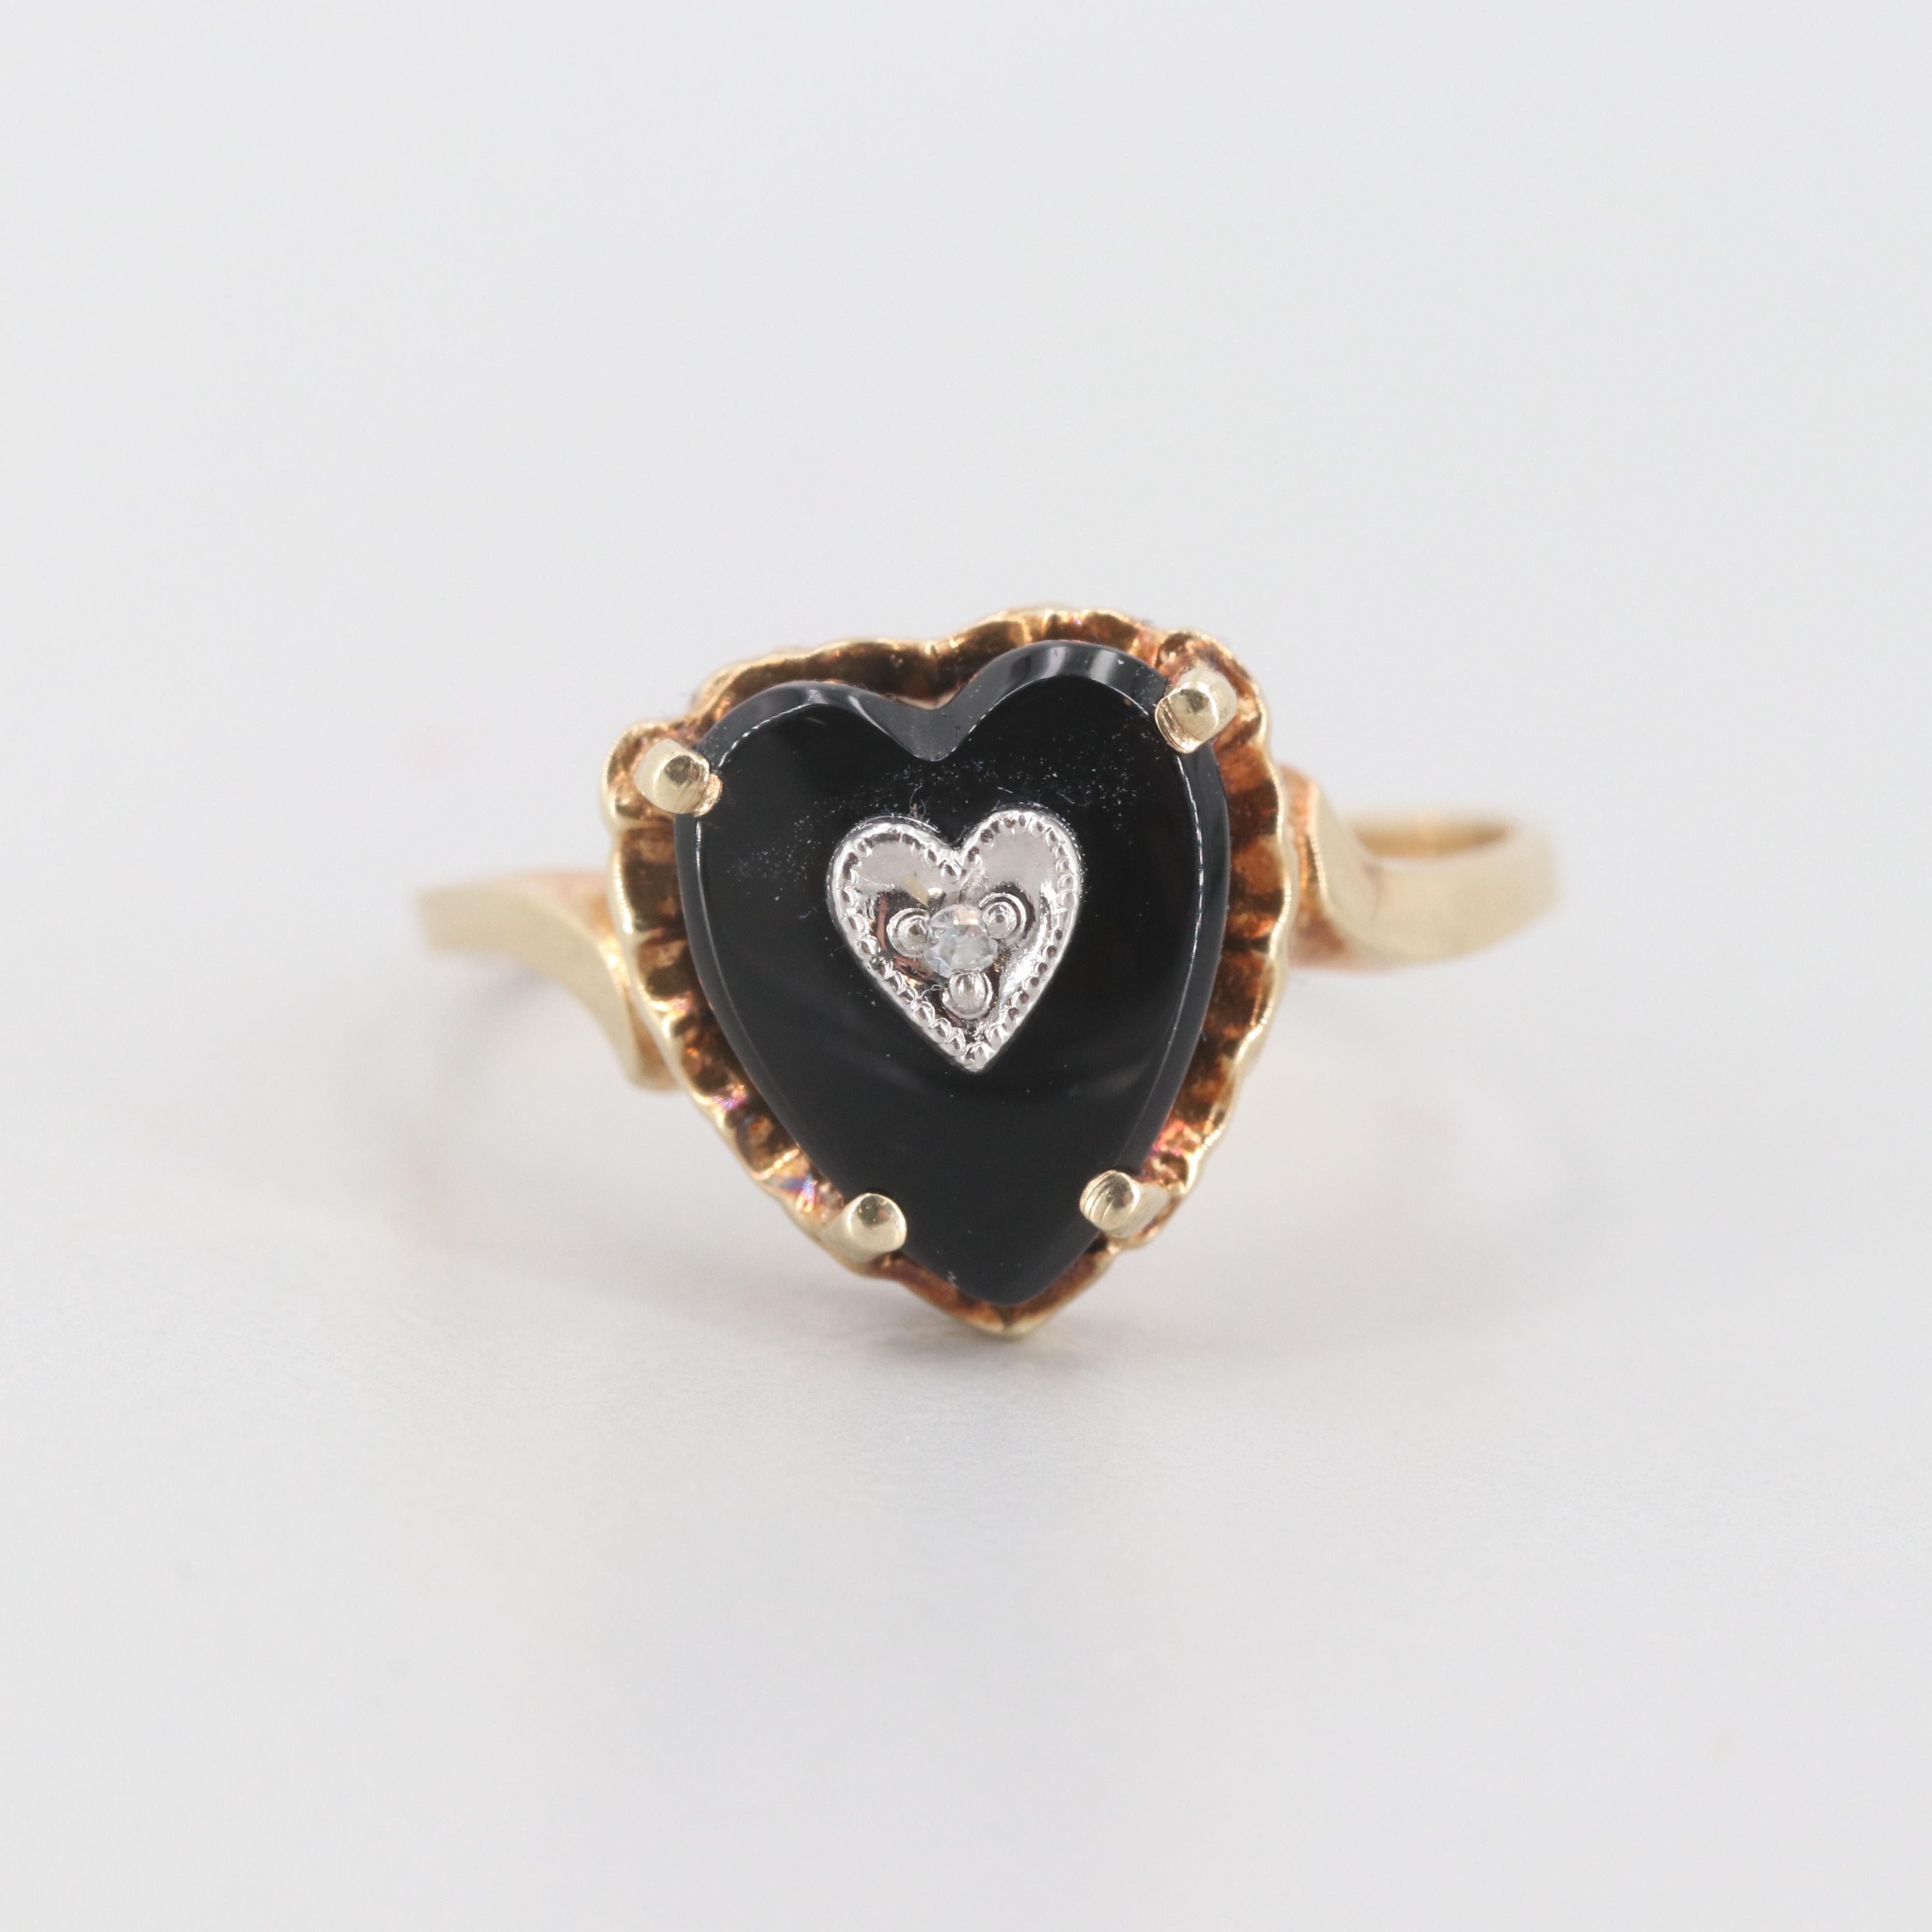 10K Yellow Gold Diamond and Black Onyx Heart Ring